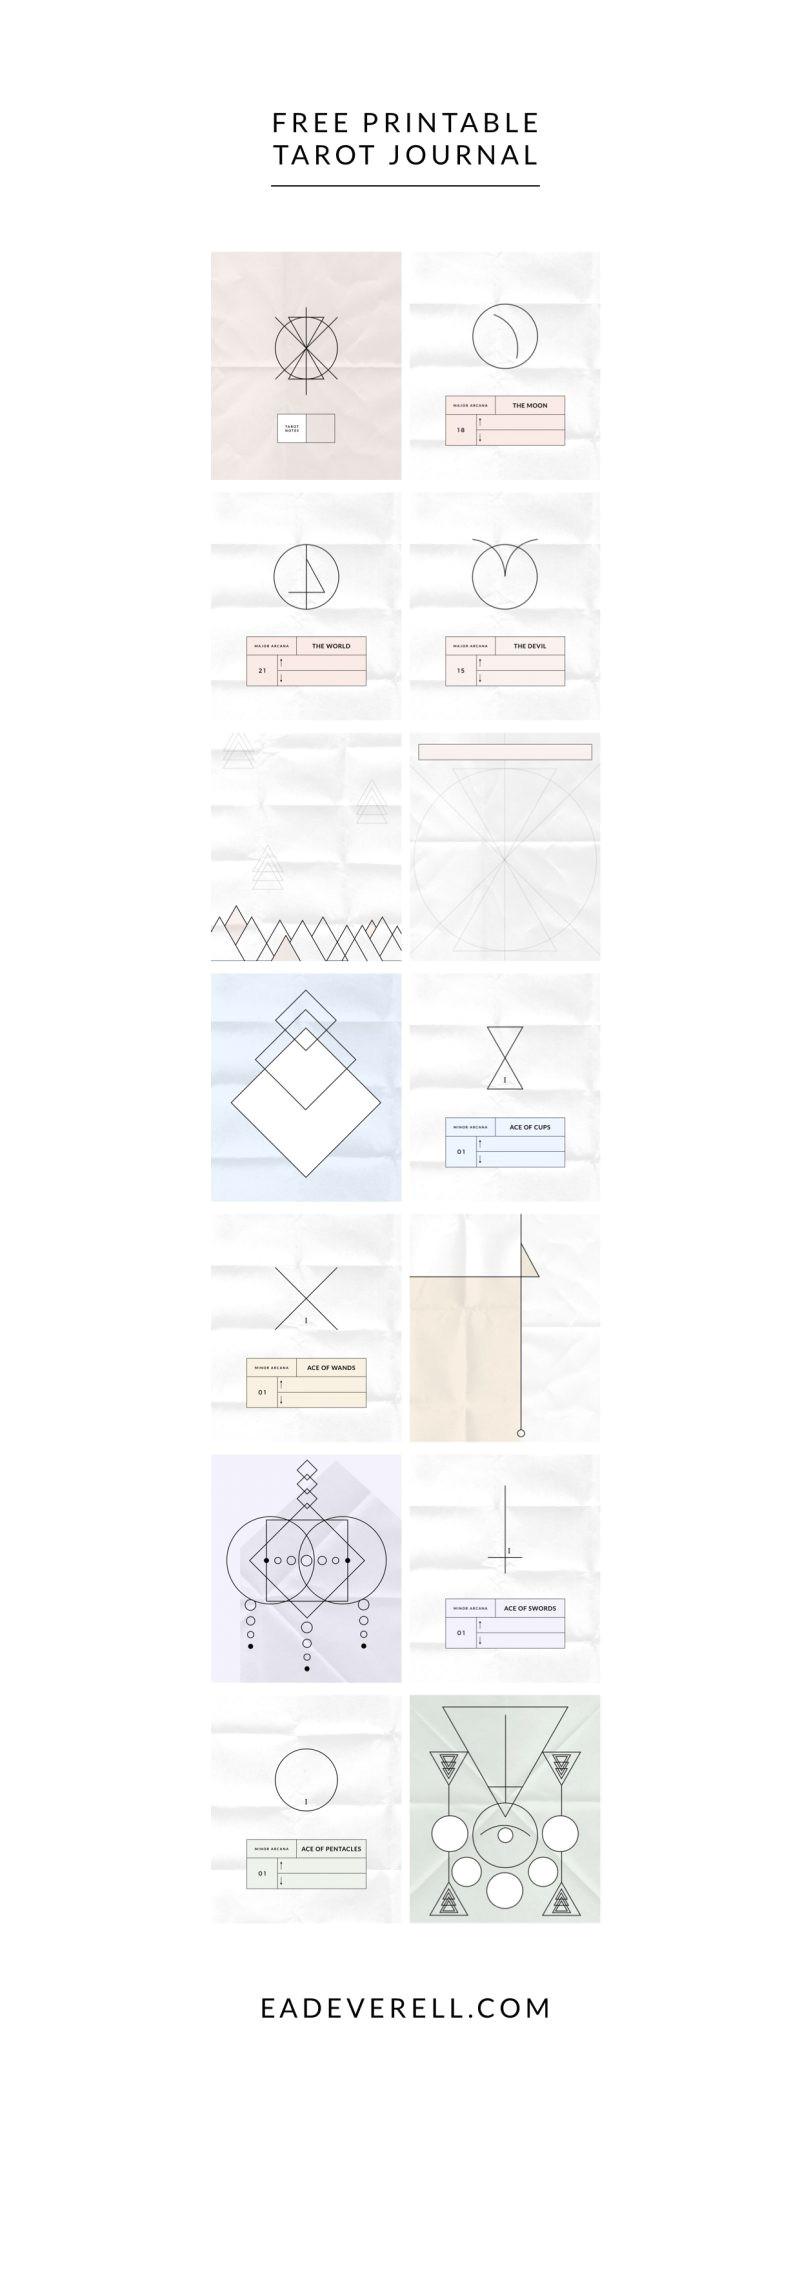 free printable tarot journal